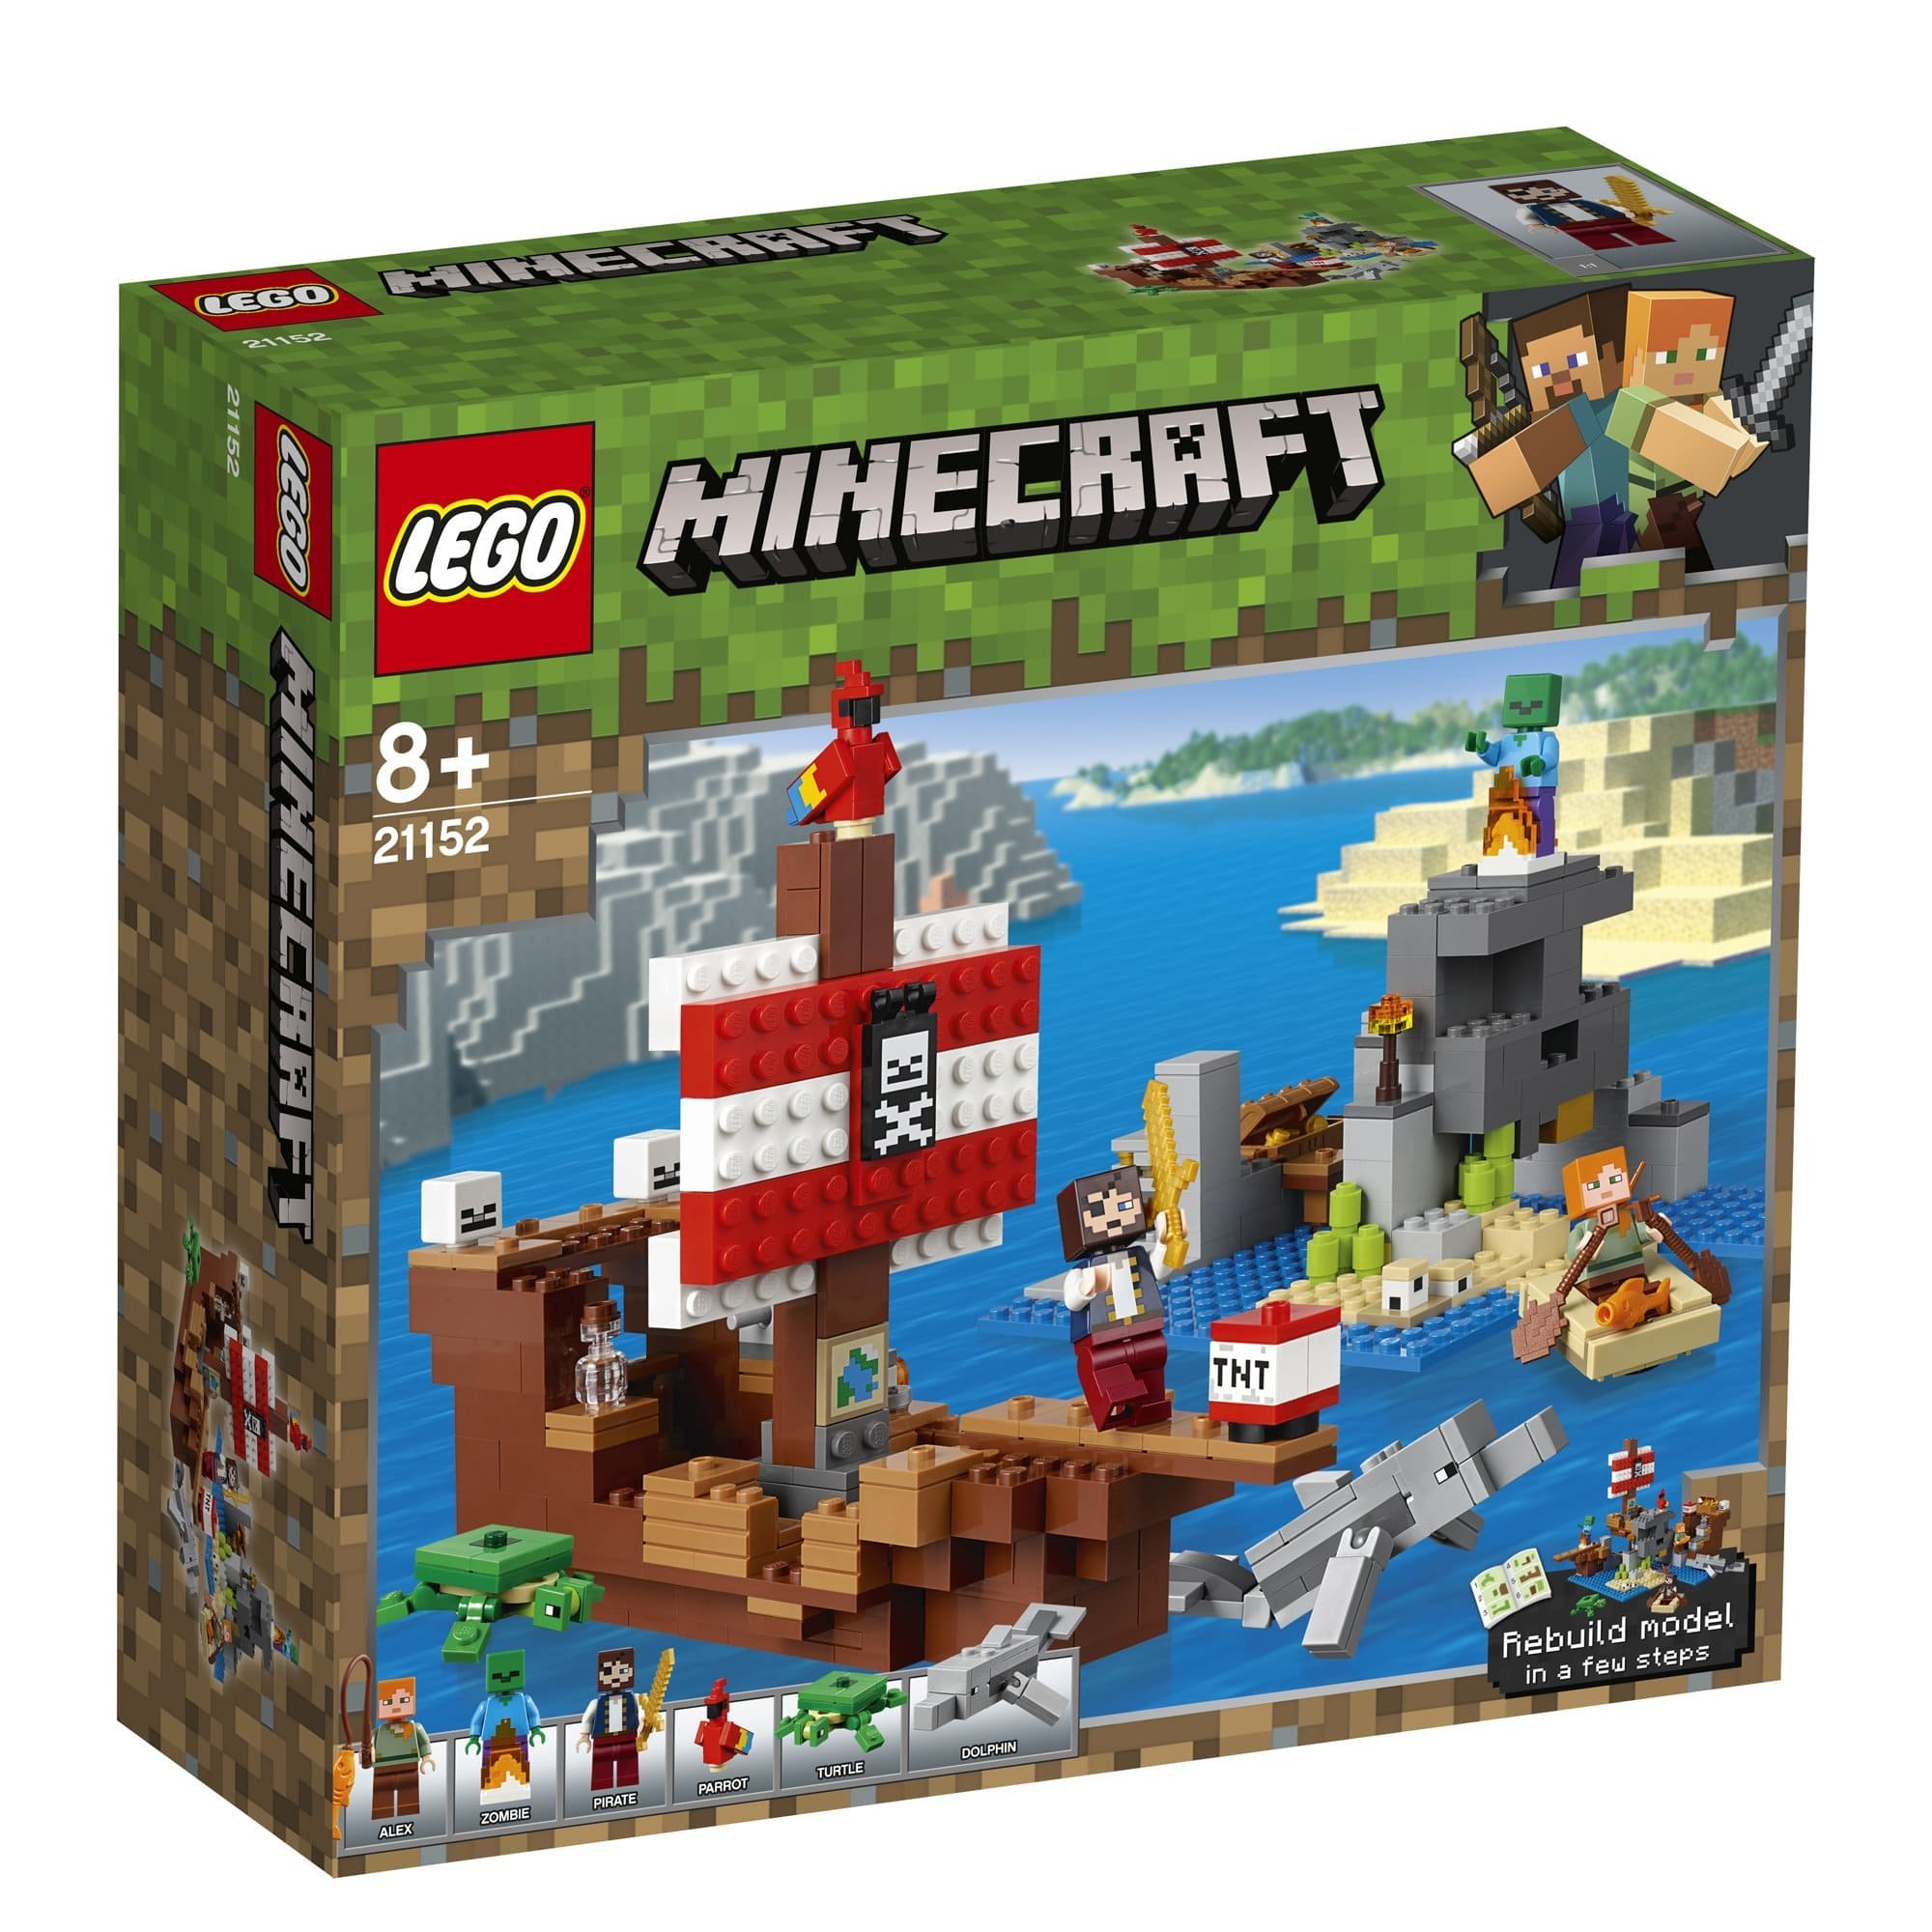 LEGO 樂高積木 Minecraft Micro World 創世神系列 21152 海盜船大冒險